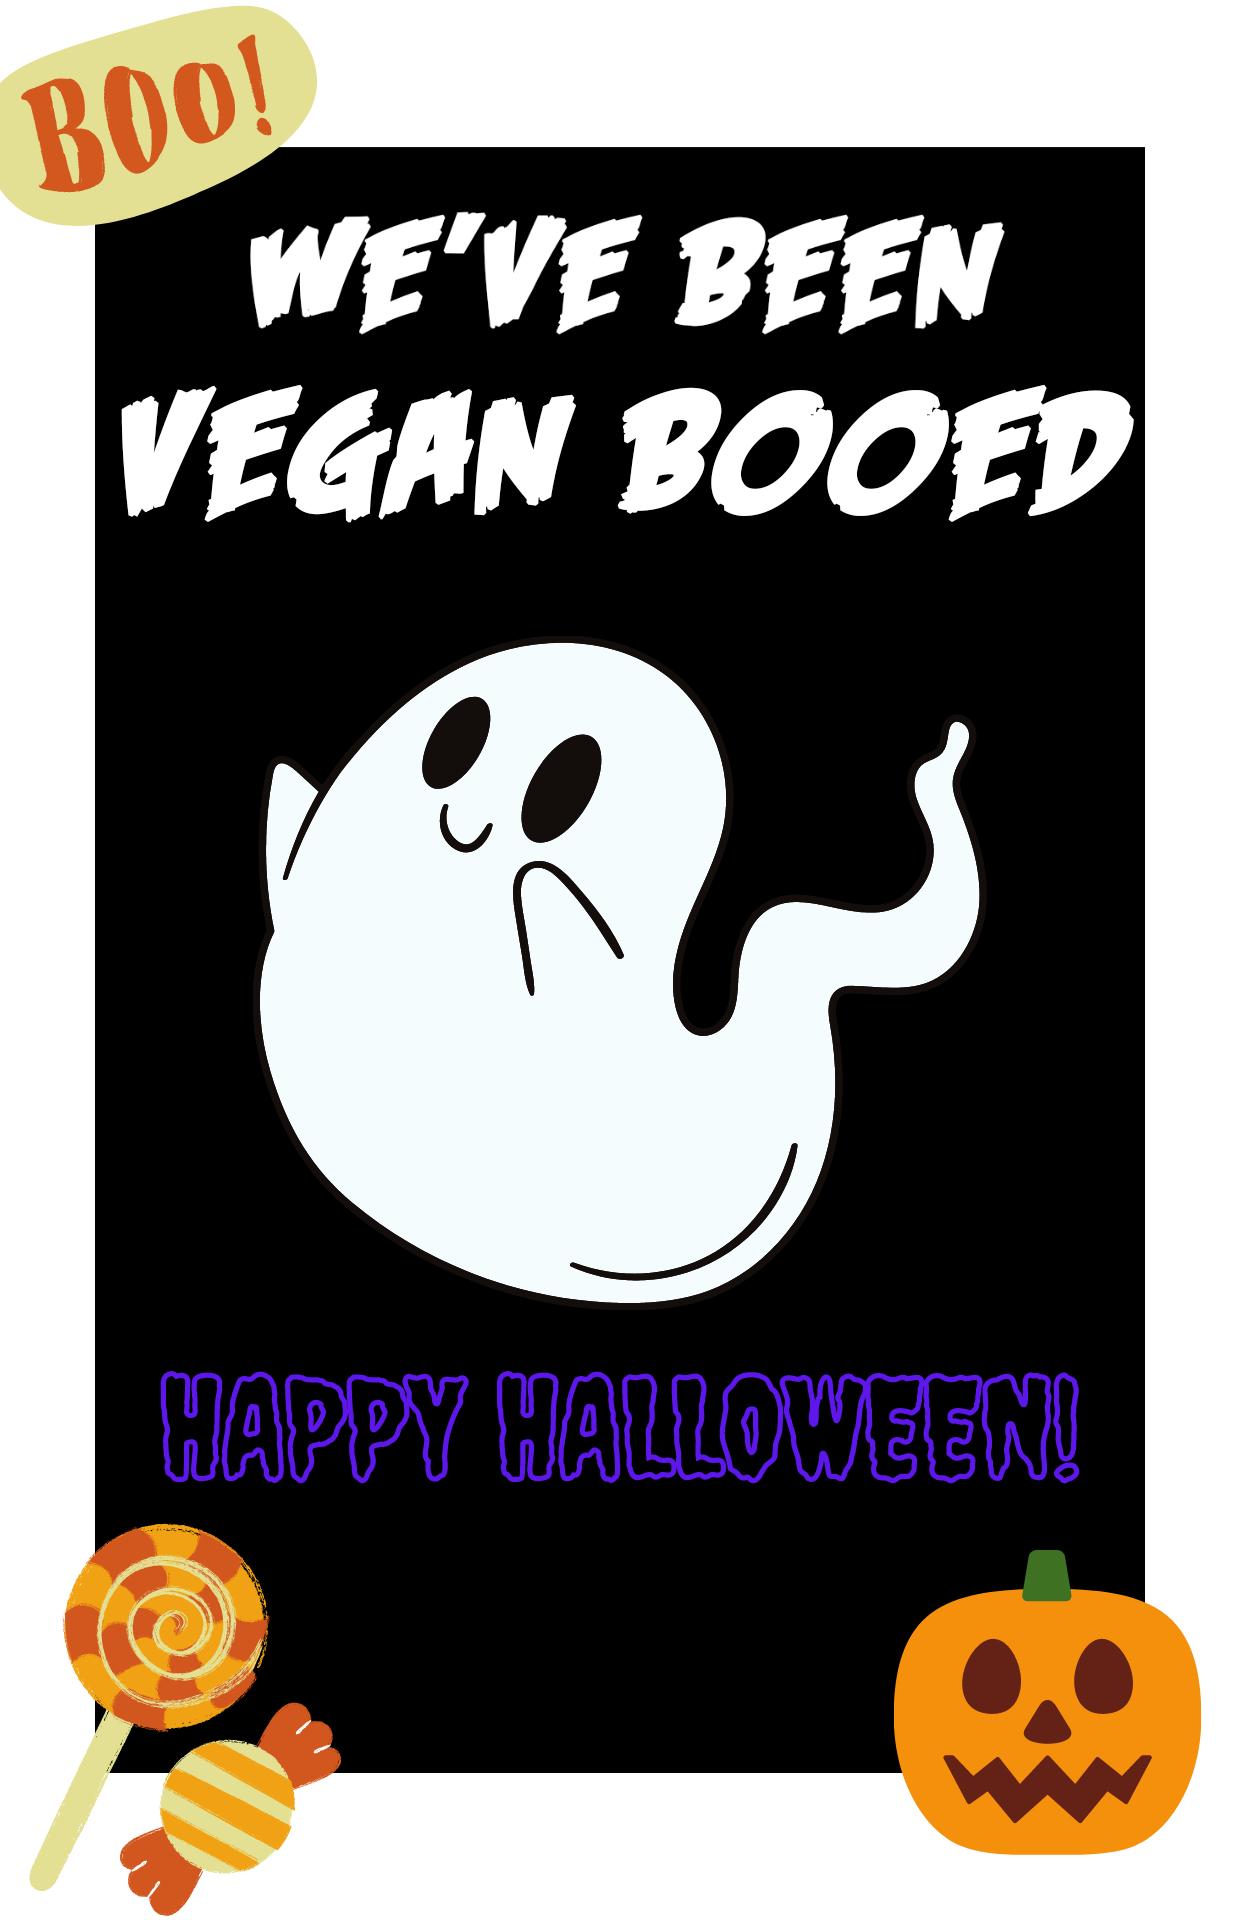 You've Been Vegan Booed Sign